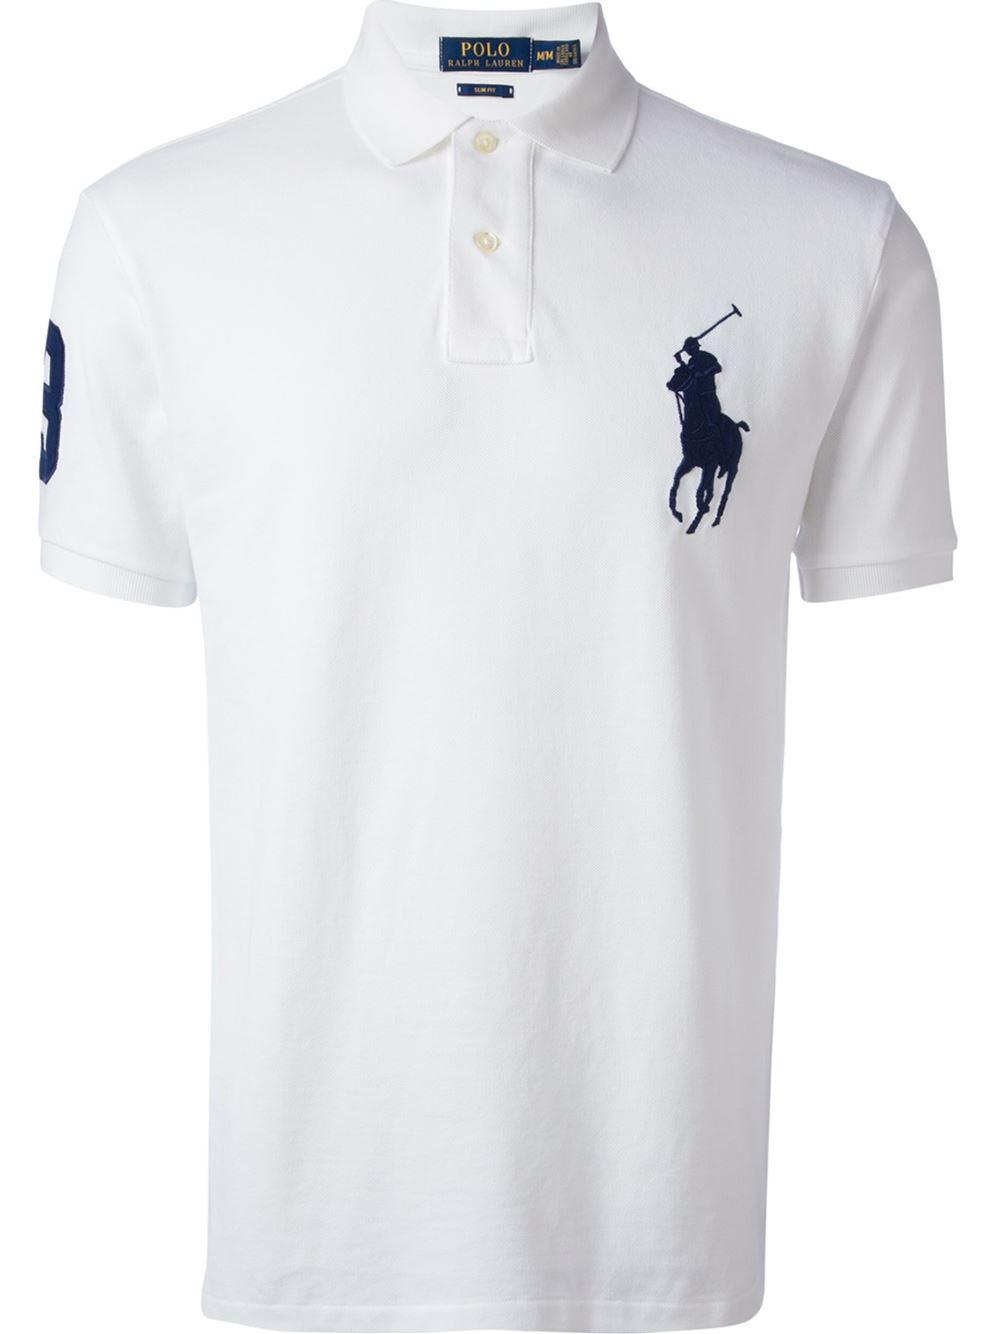 Polo ralph lauren oversized logo slim fit polo shirt in for Ralph lauren logo shirt